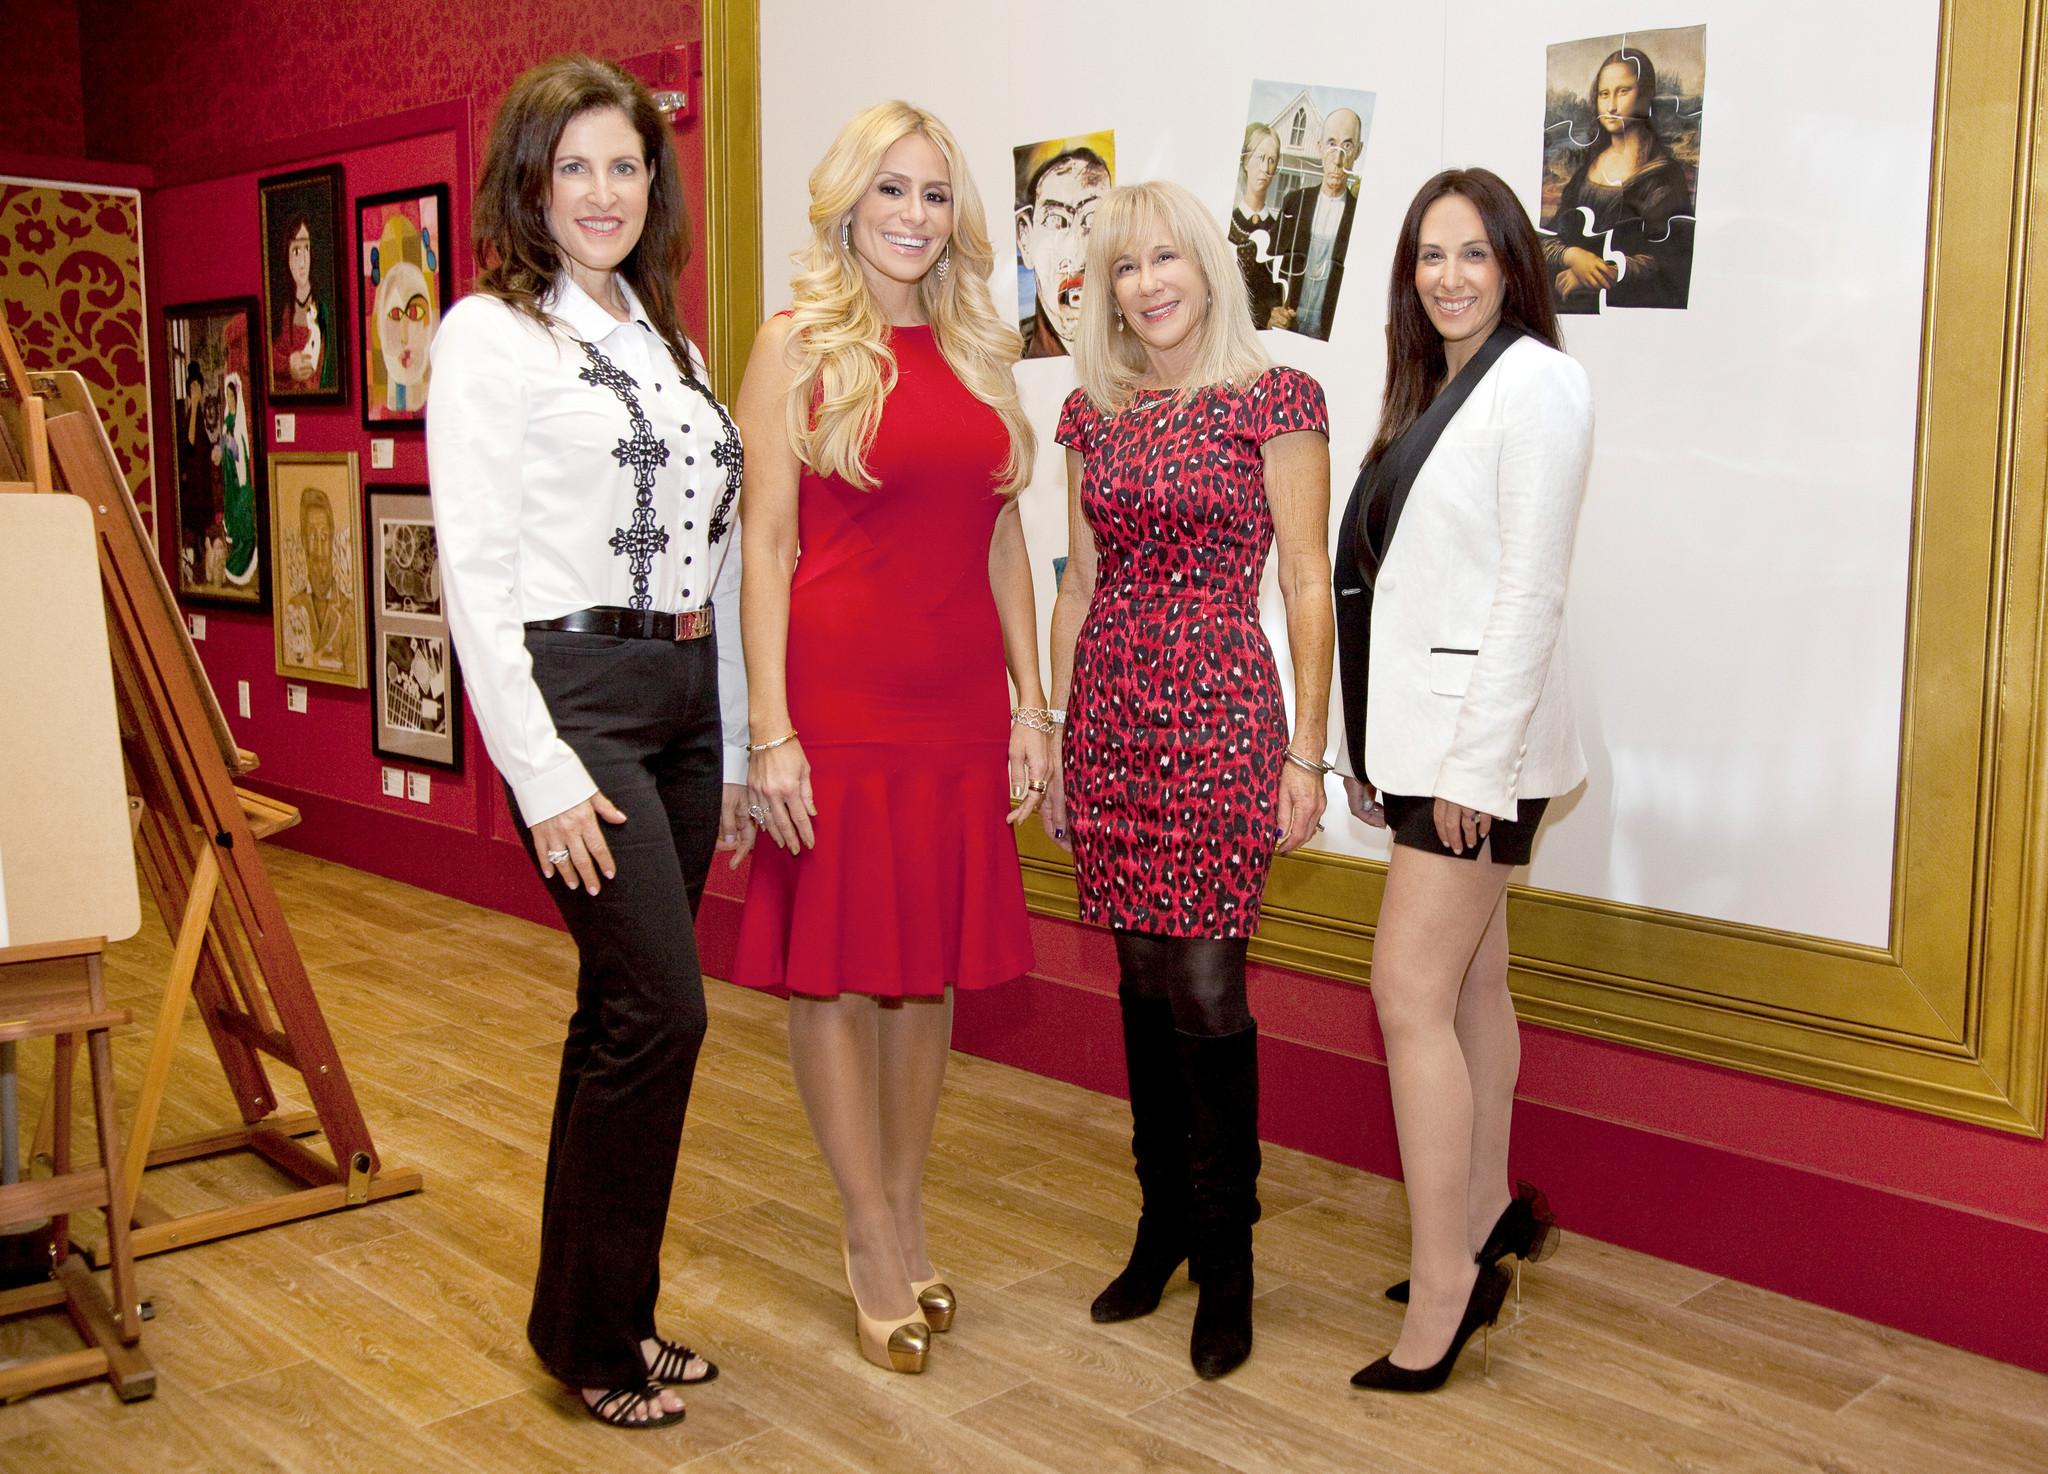 Society Scene photos - Martine Zinn, left, Maya Ezratti, Mindy Shrago and Jodi Epstein support Young At Art Museum